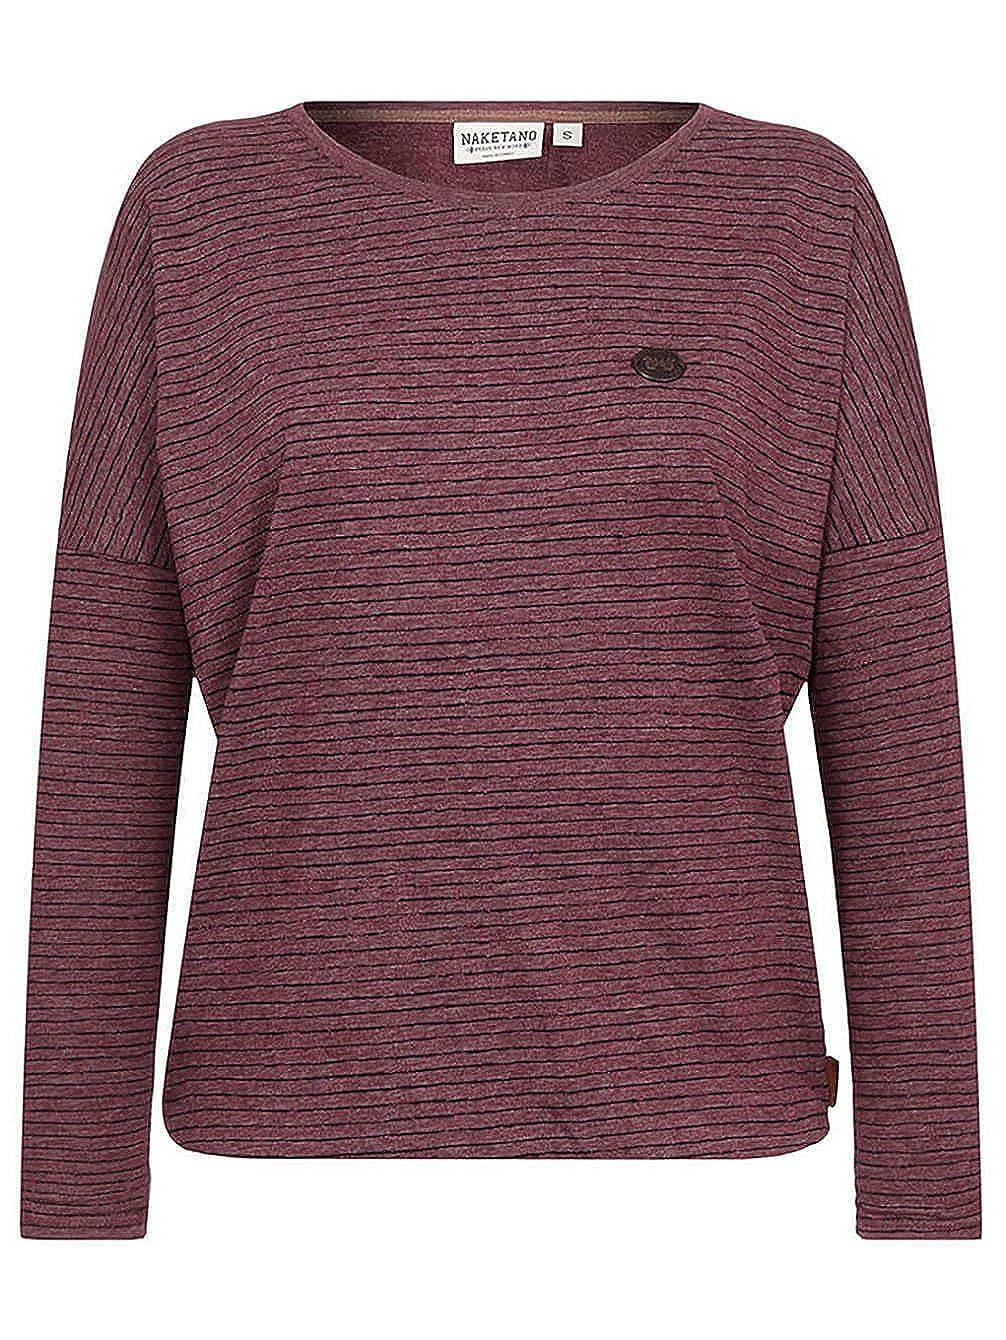 Naketano Damen Longsleeve Zeich Ma Titten T Shirt LS: Amazon